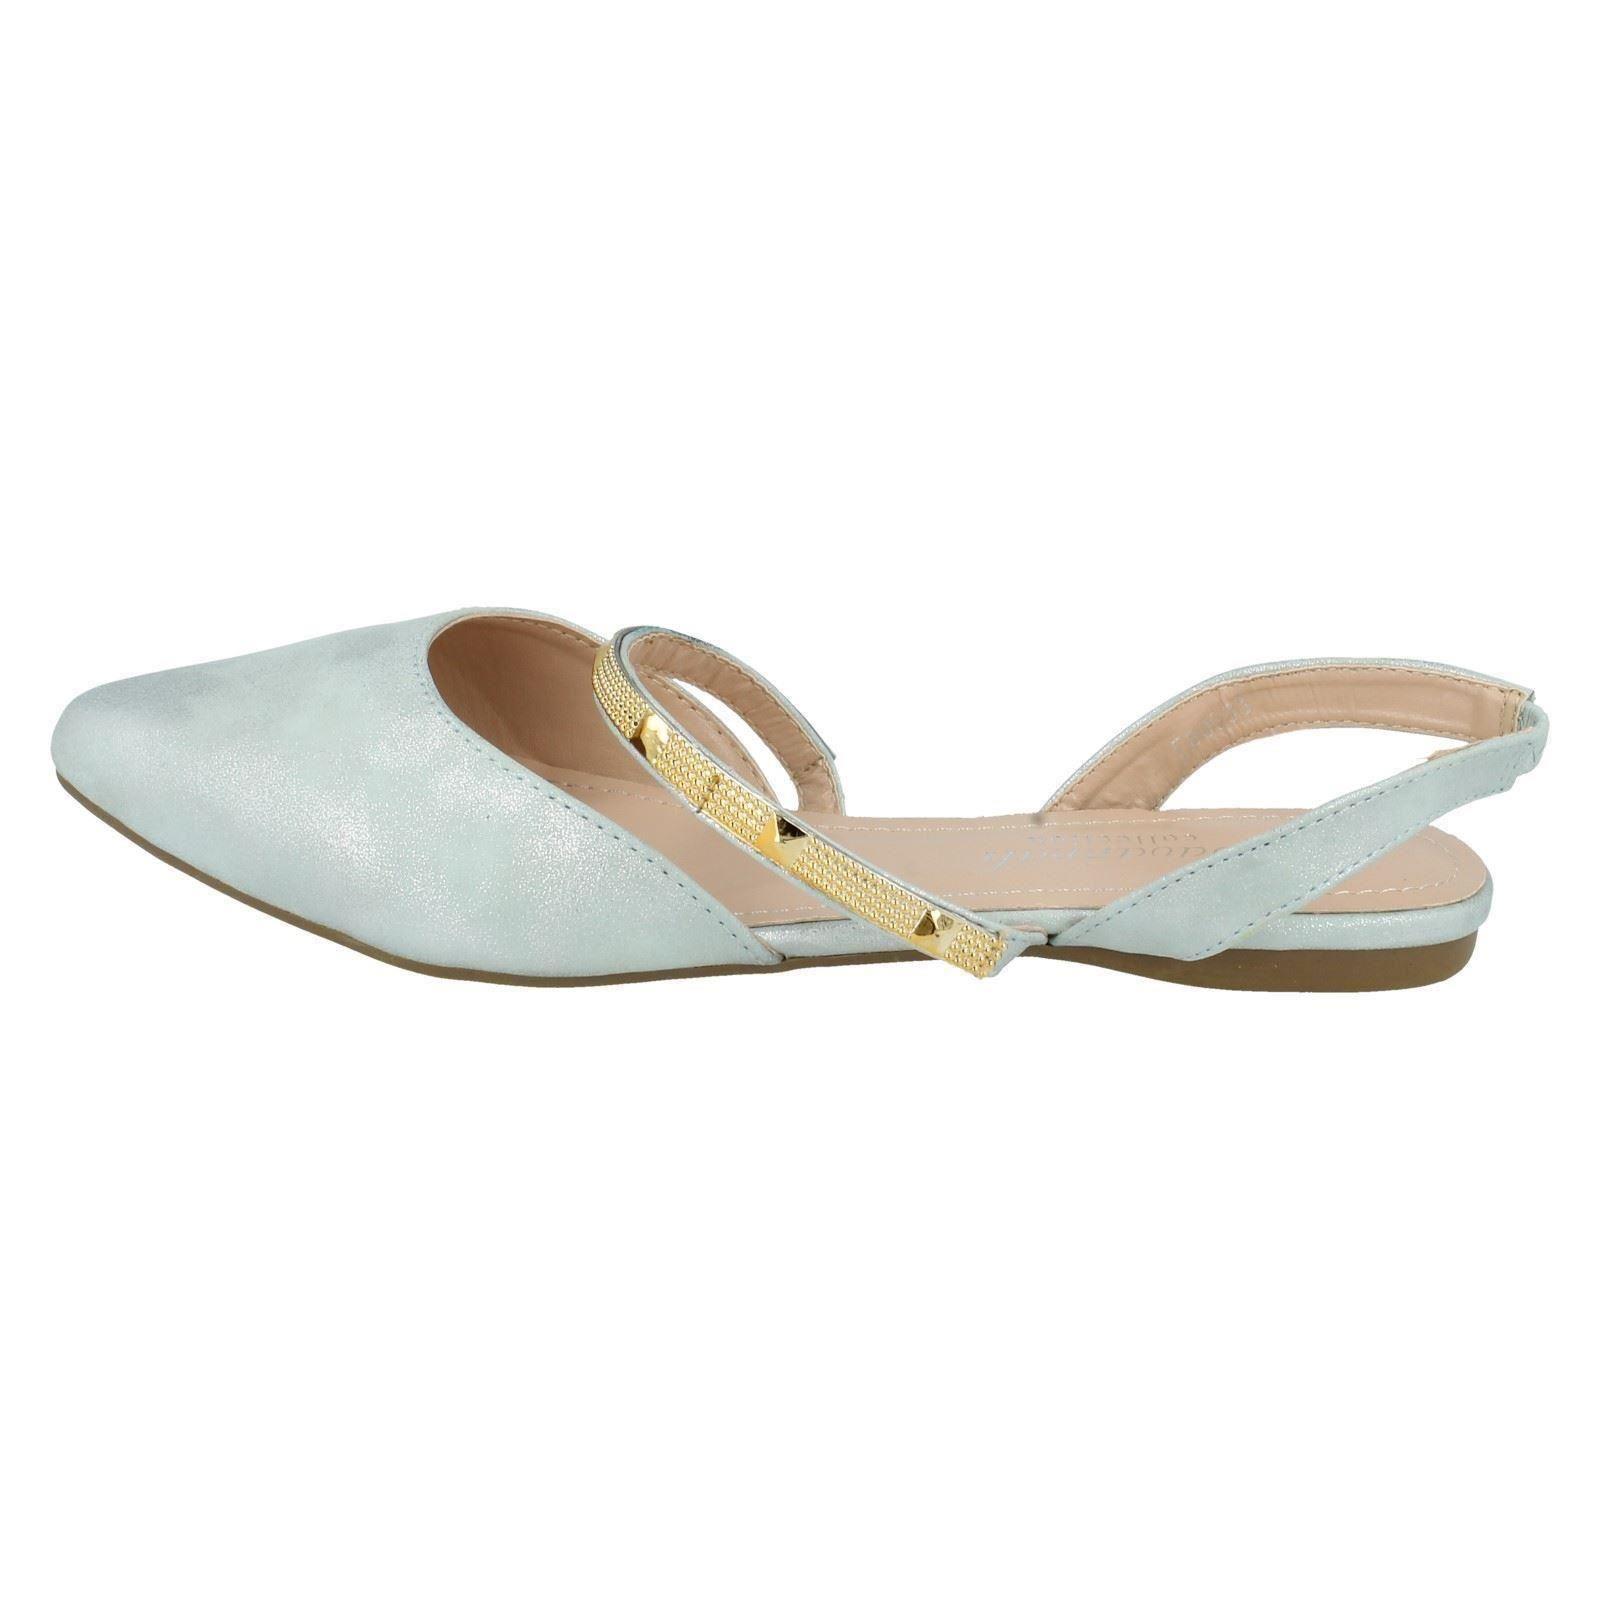 Señoras Sabana Plana Zapatos Estilo-f80053